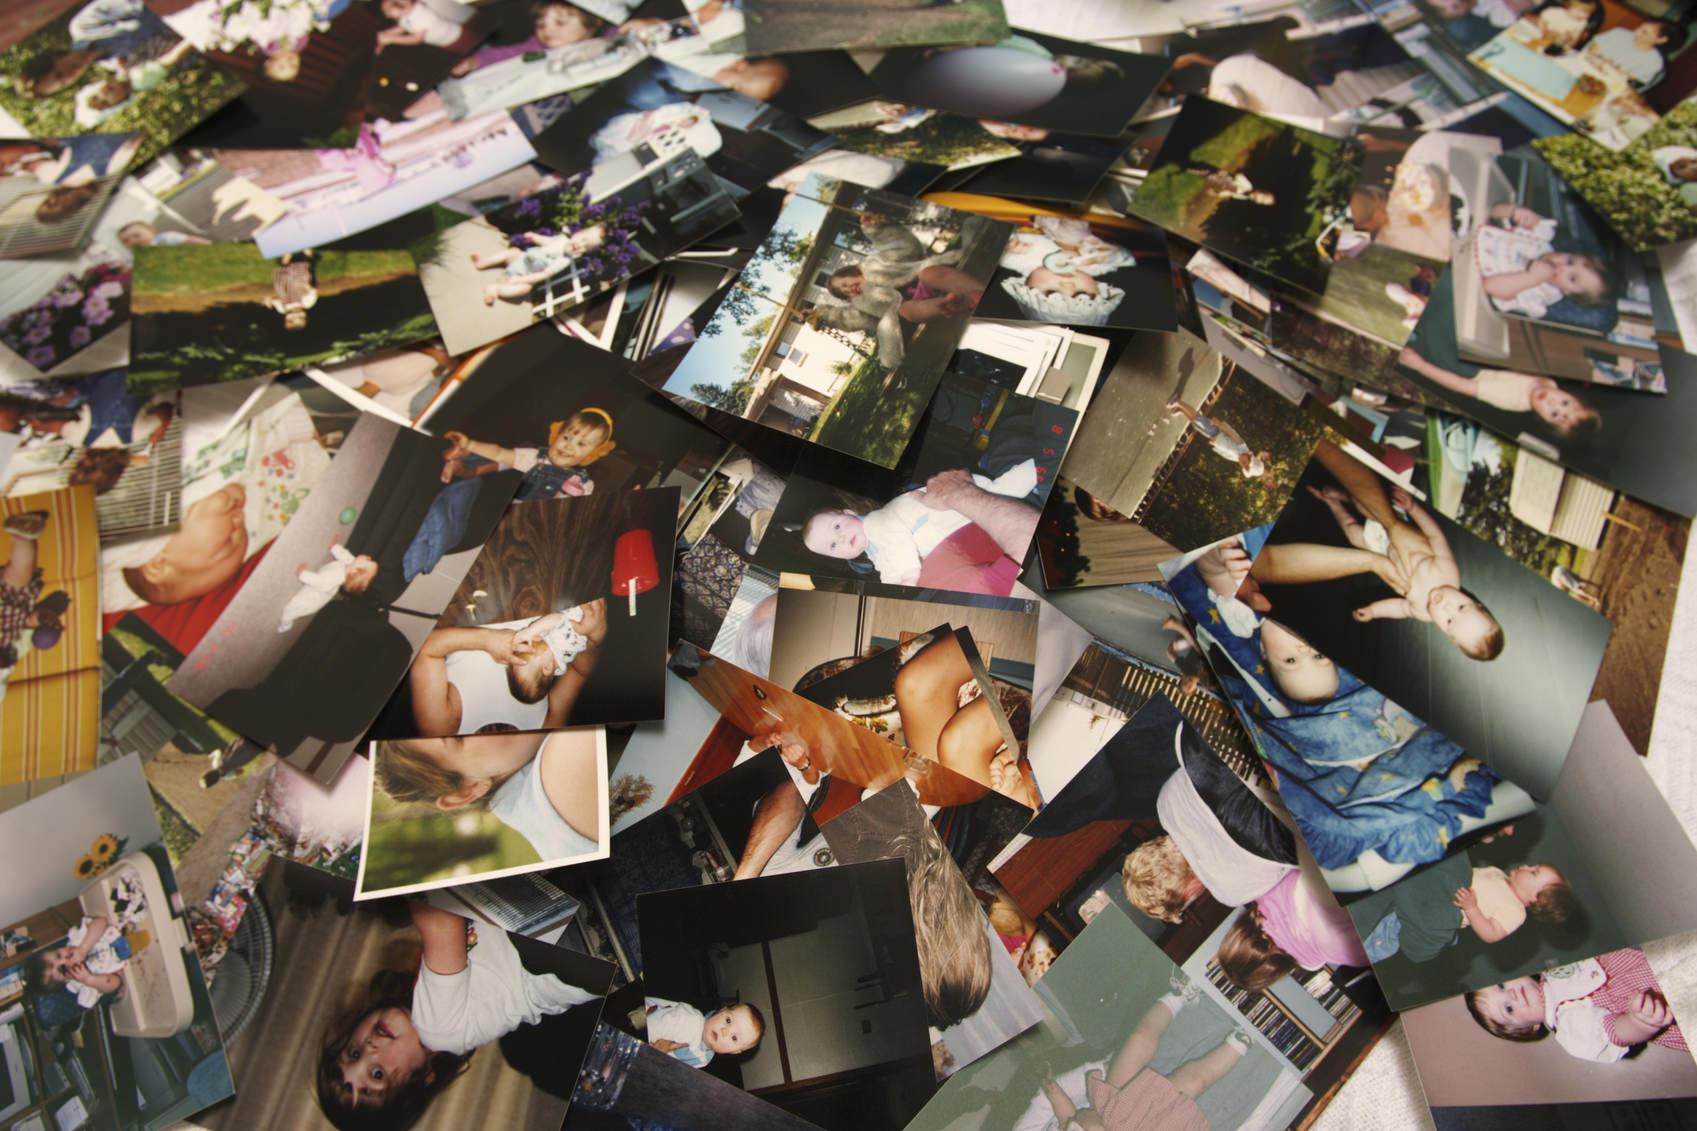 iStock 570929 MEDIUM image